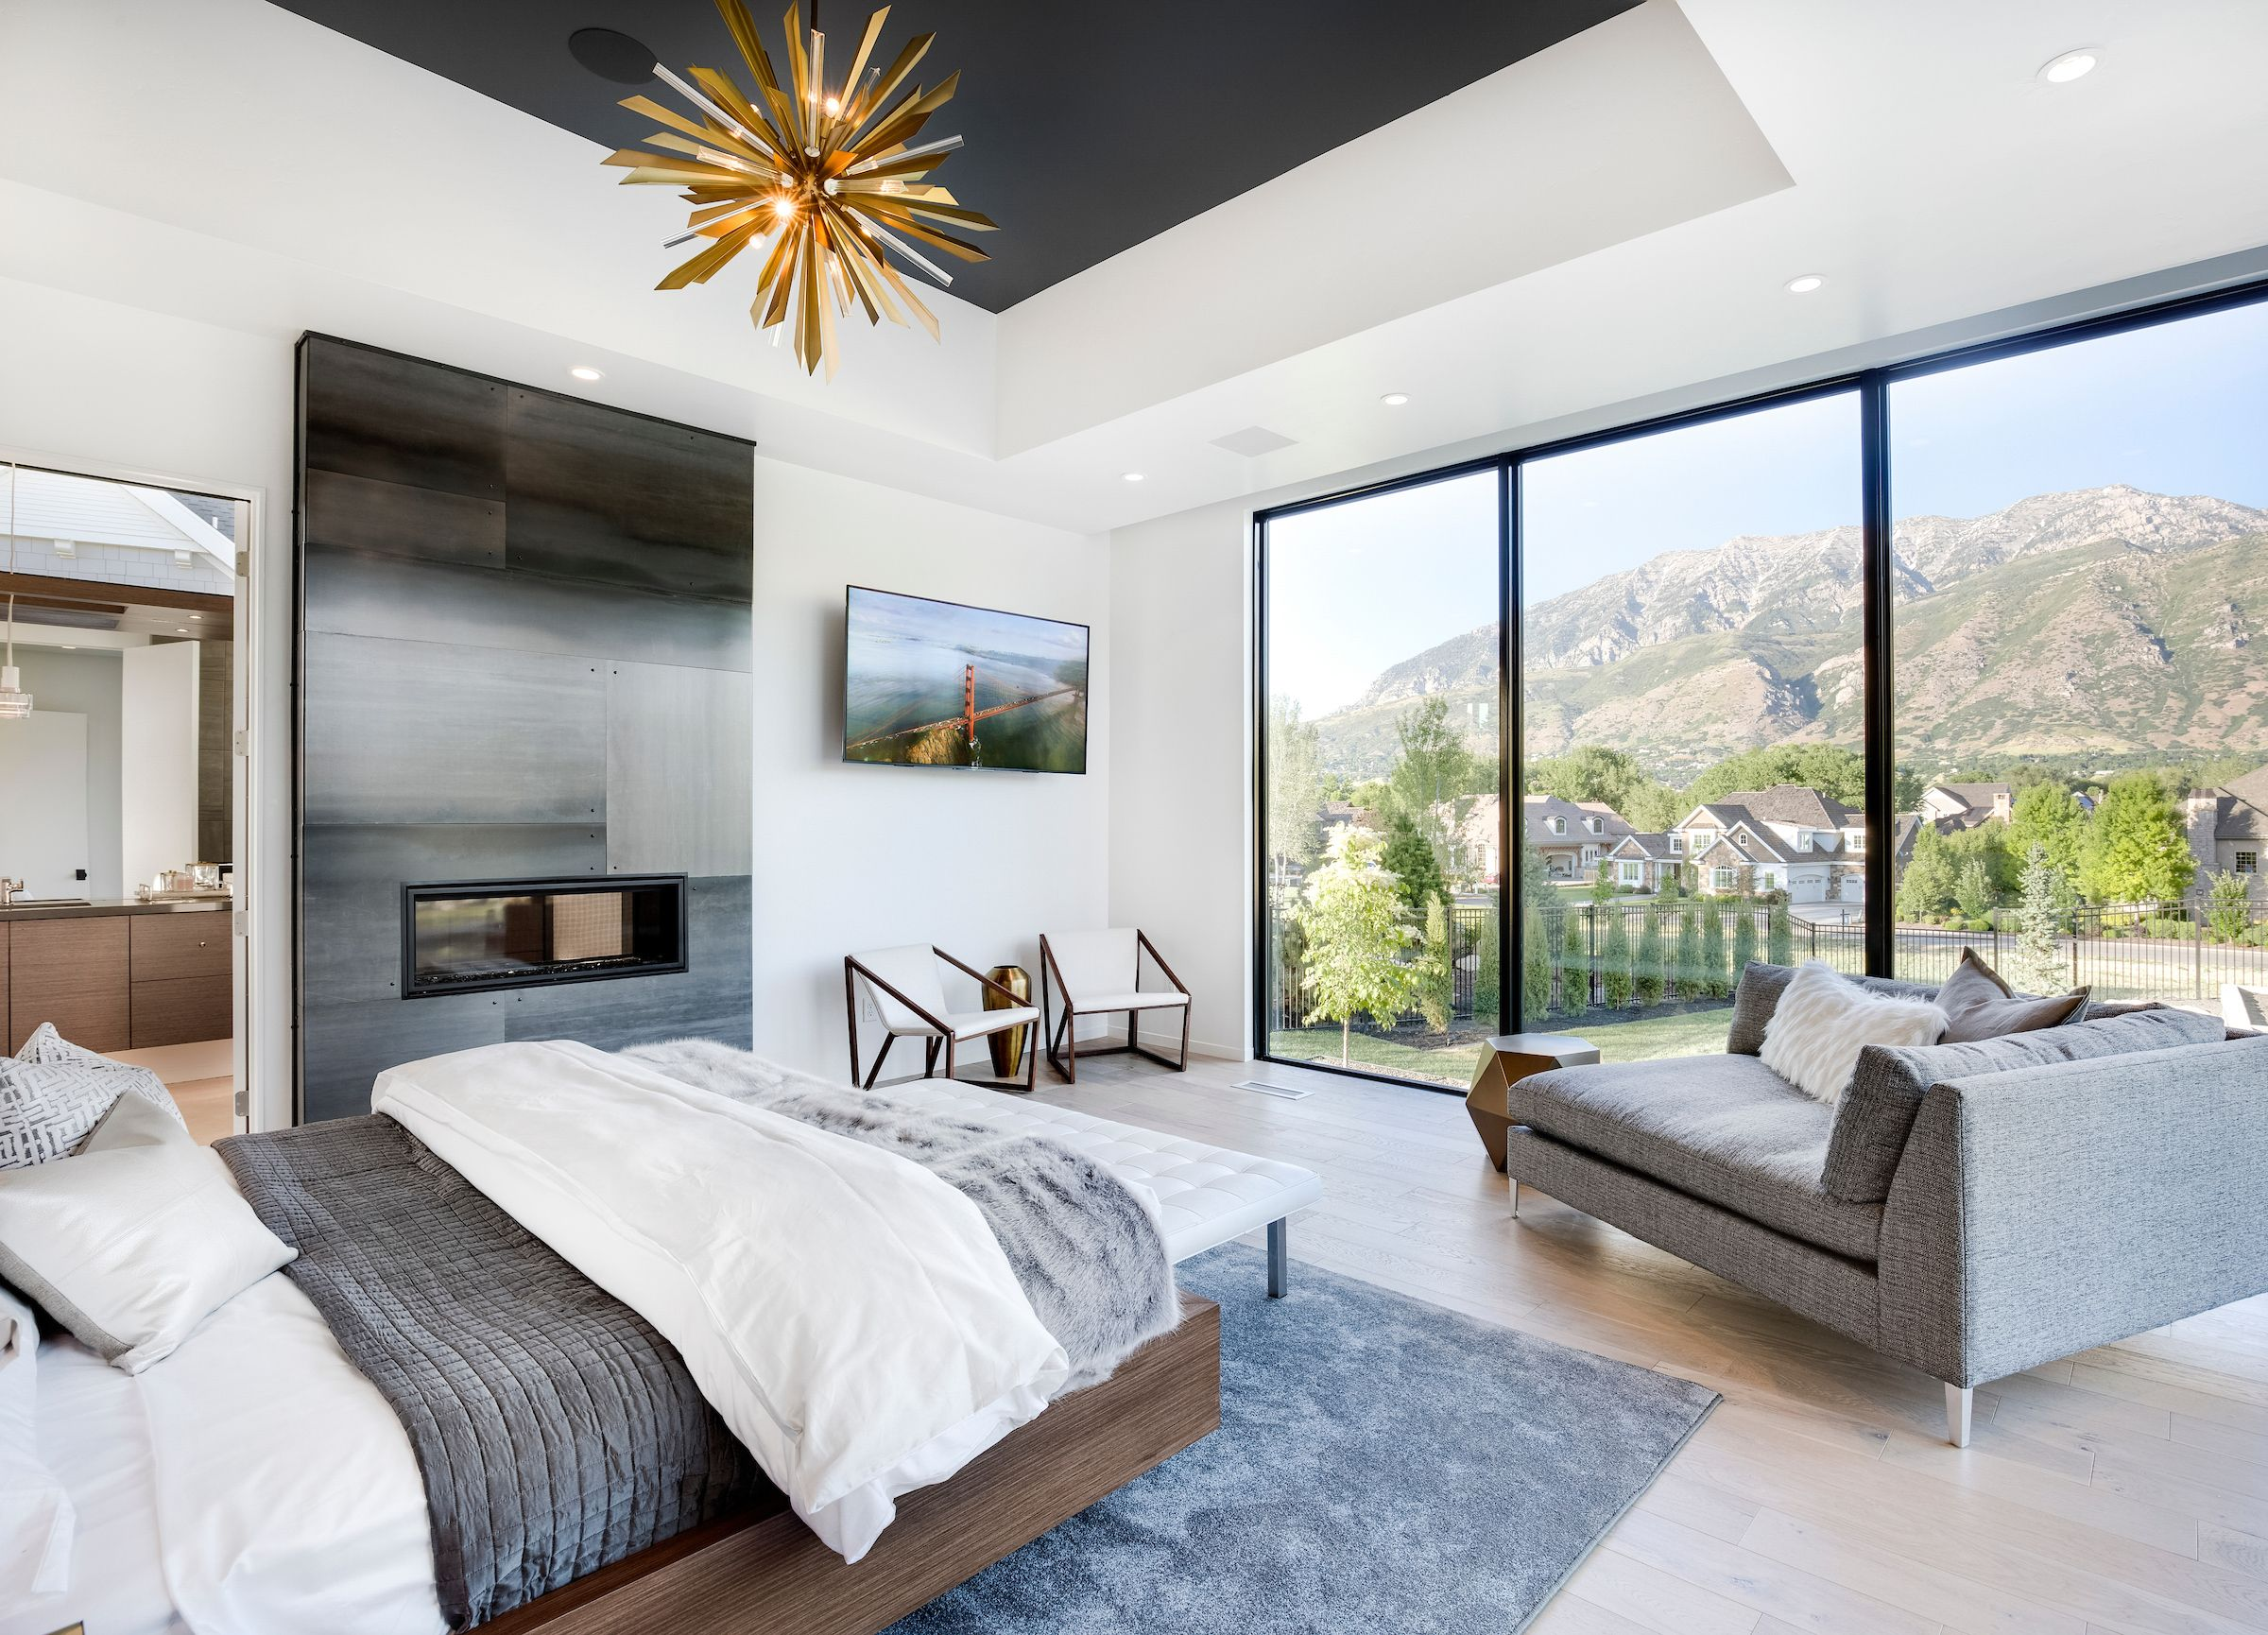 Best Modern Master Bedroom The Room Has Floor To Ceiling 640 x 480